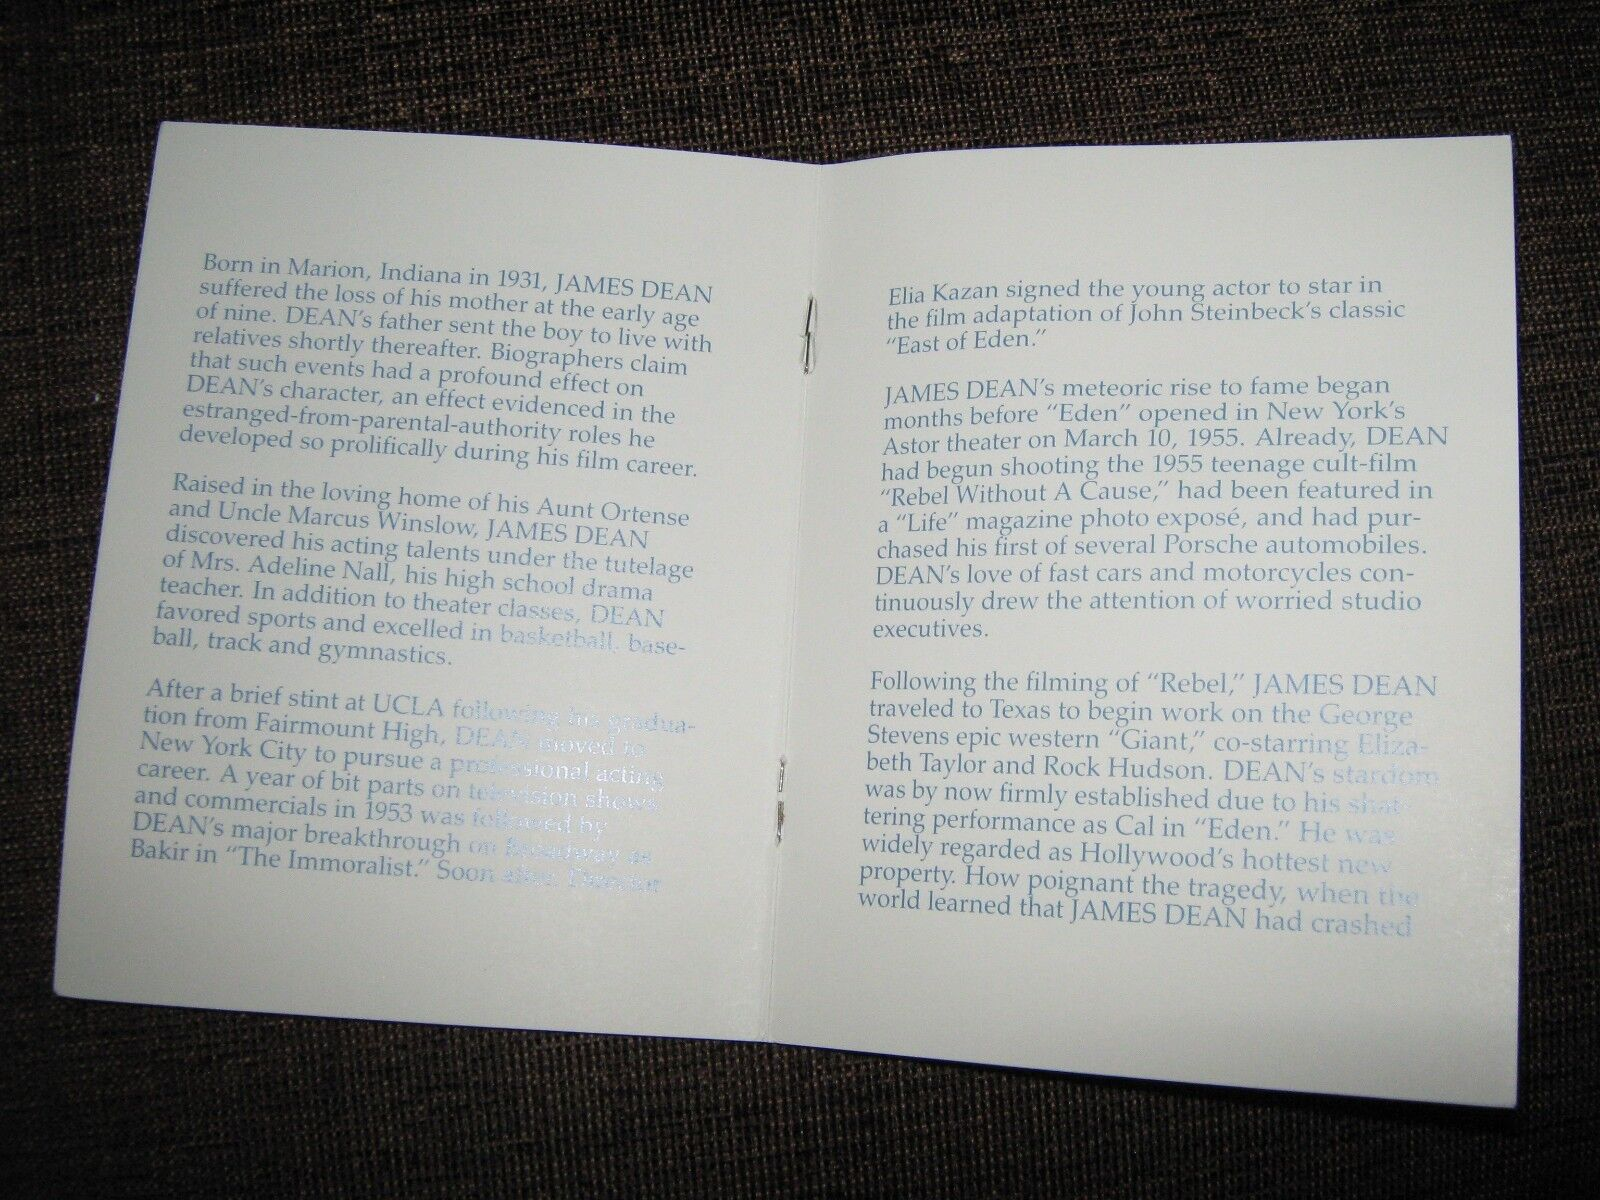 JAMES DEAN DOLL , 1985 ,THE JAMES DEAN FOUNDATION